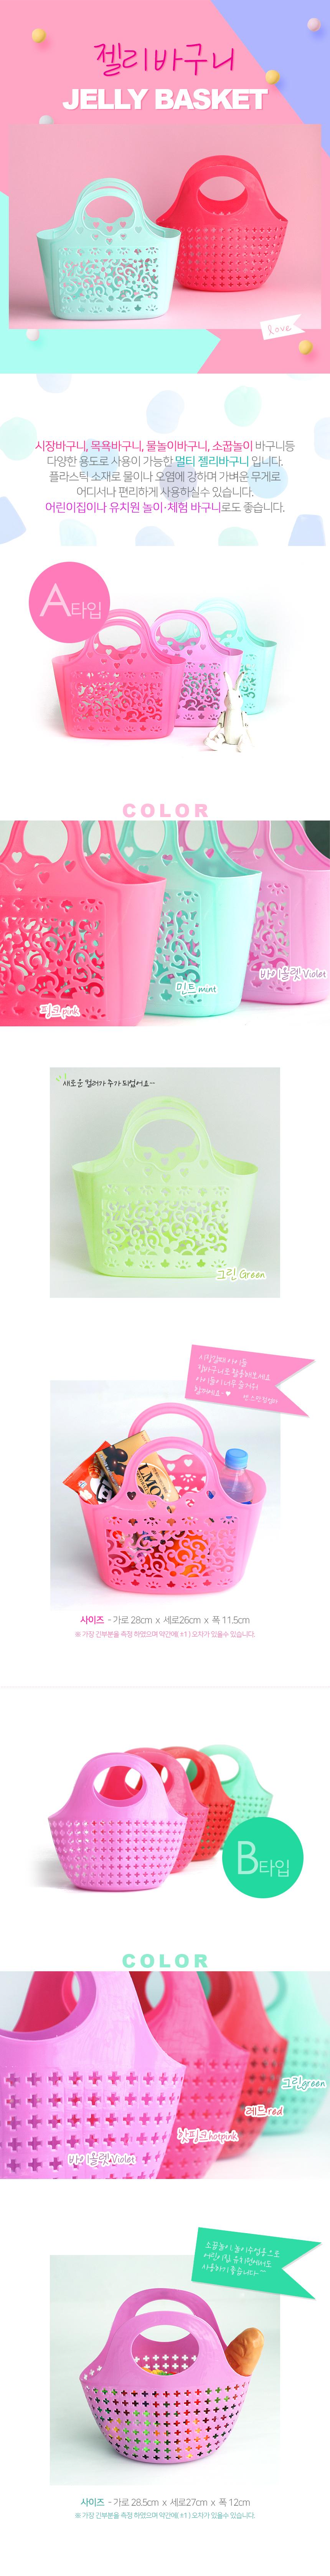 jellybasket.jpg